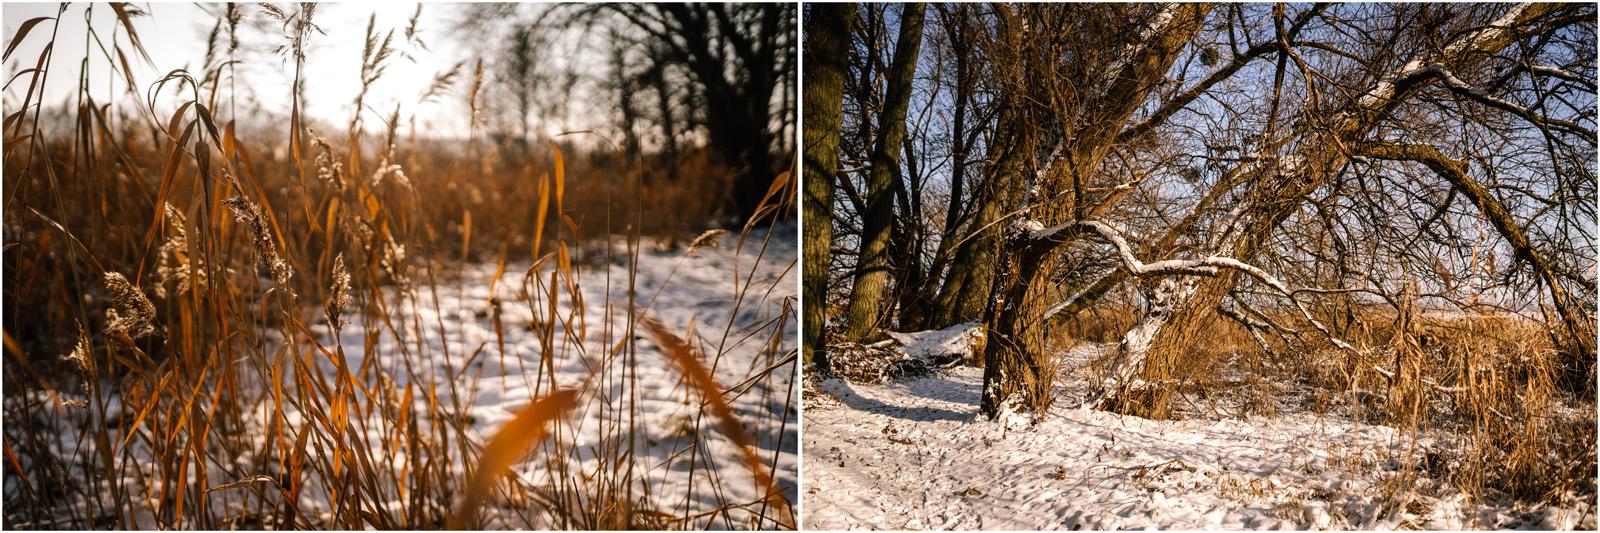 Paulina & Bartek | zimowa sesja nad jeziorem 17